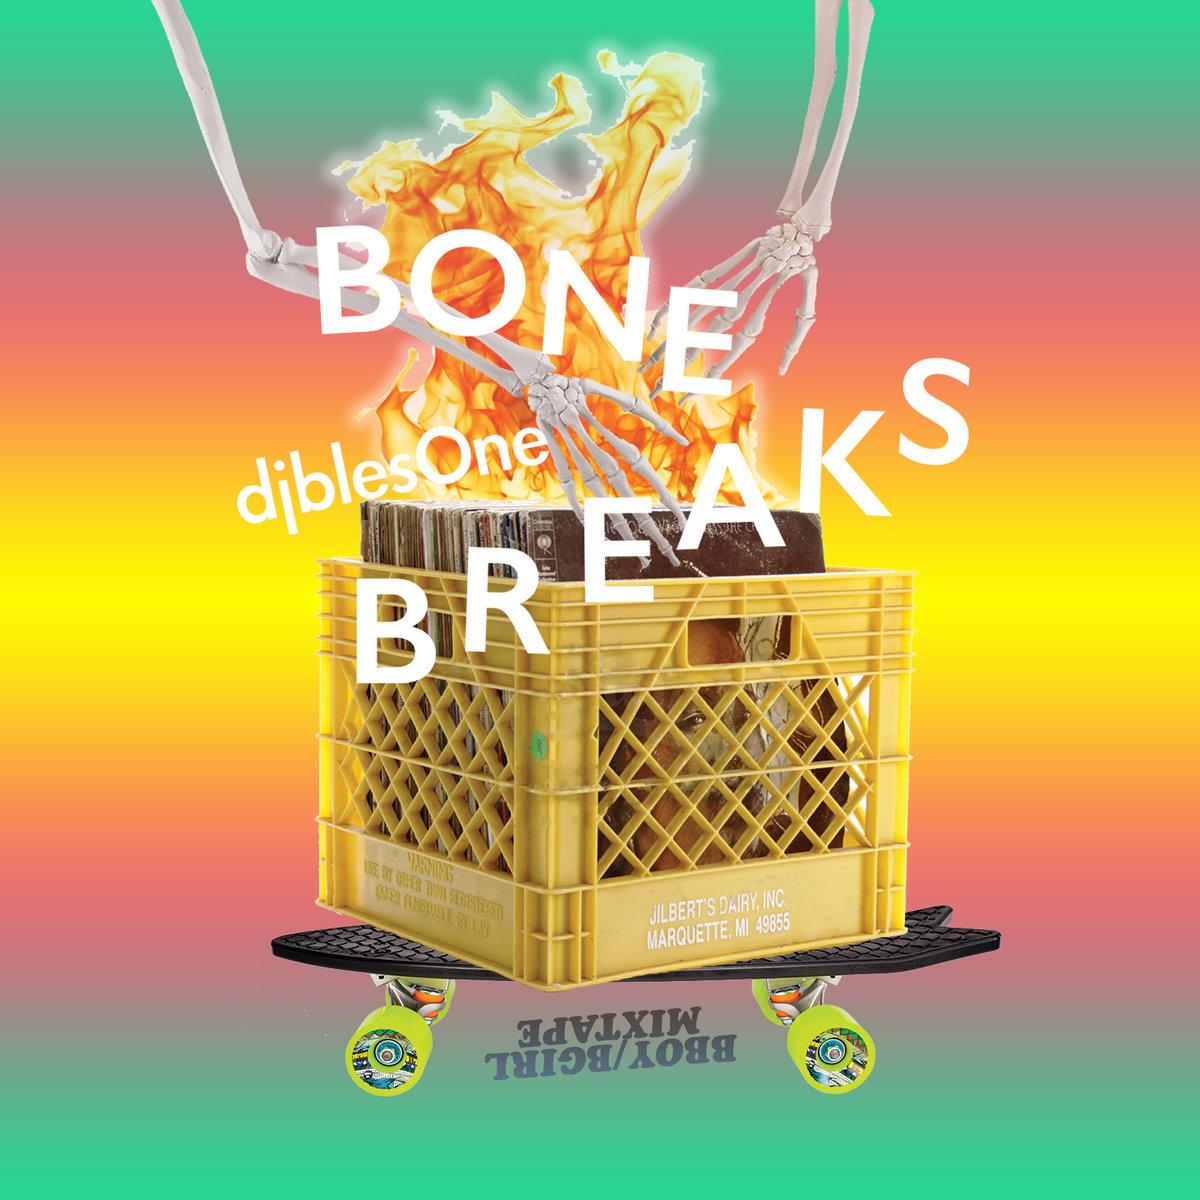 Bone Breaks Mixtape Djblesone